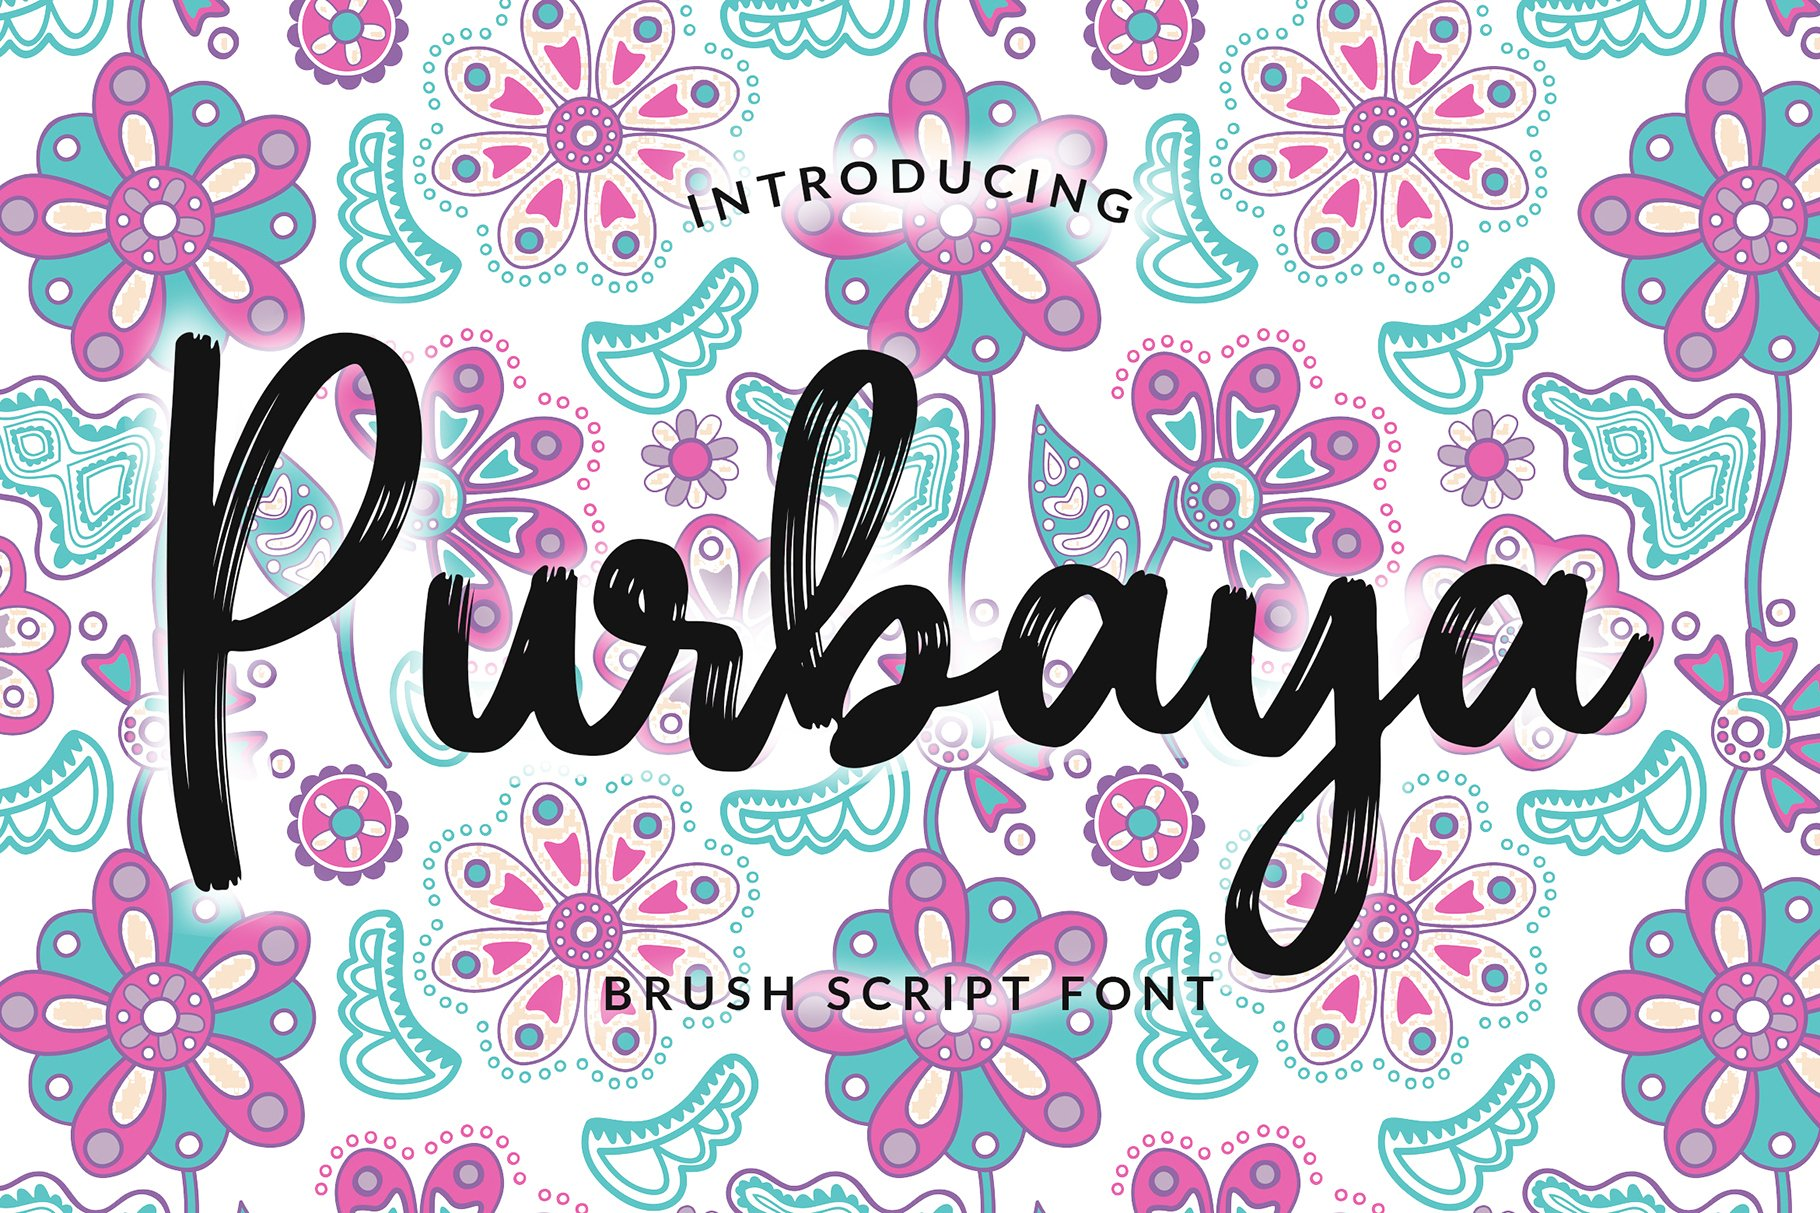 Purbaya Brush Script Typeface example image 1